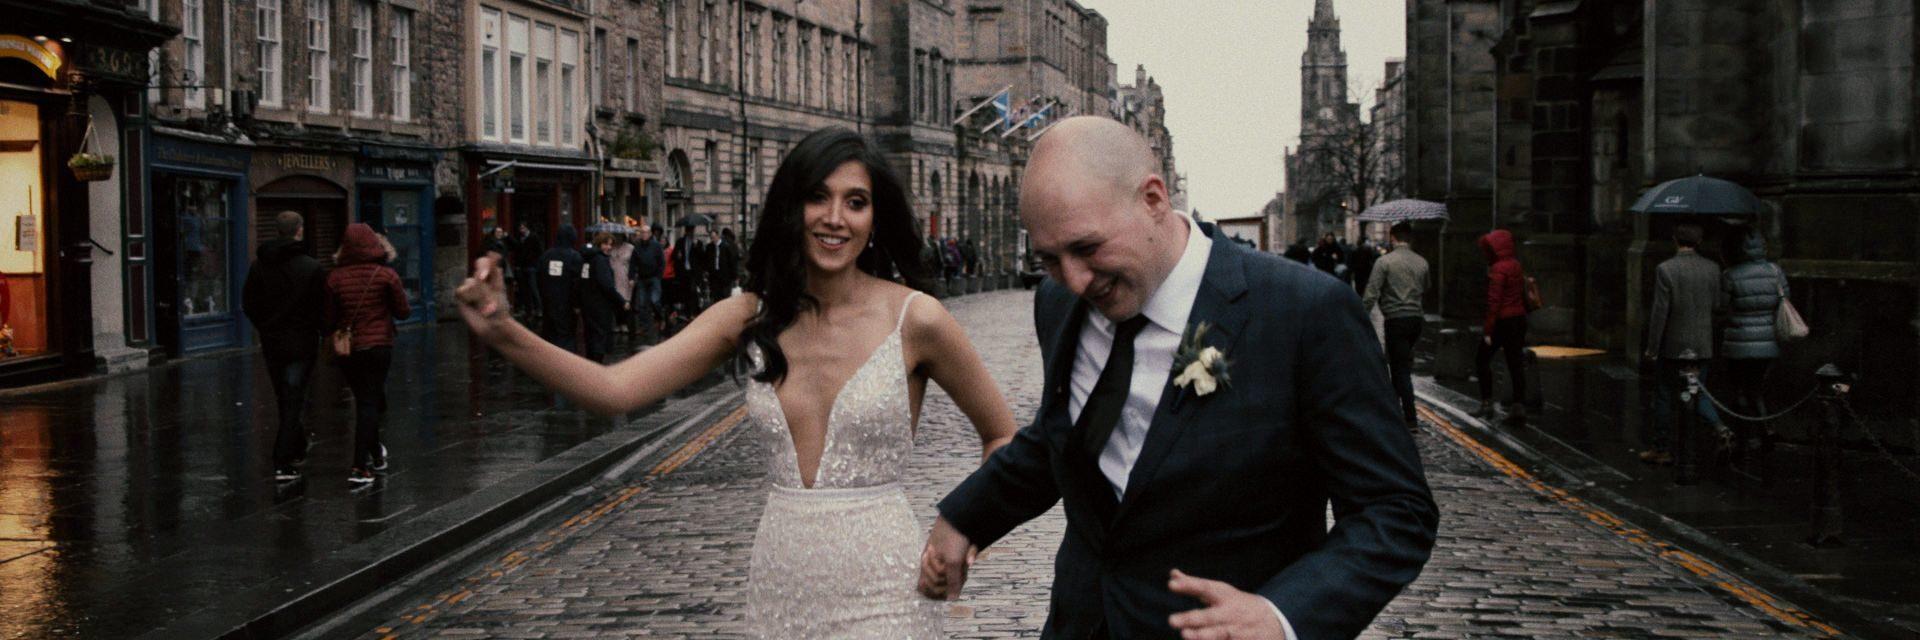 Brac-wedding-videographer-cinemate-films-04